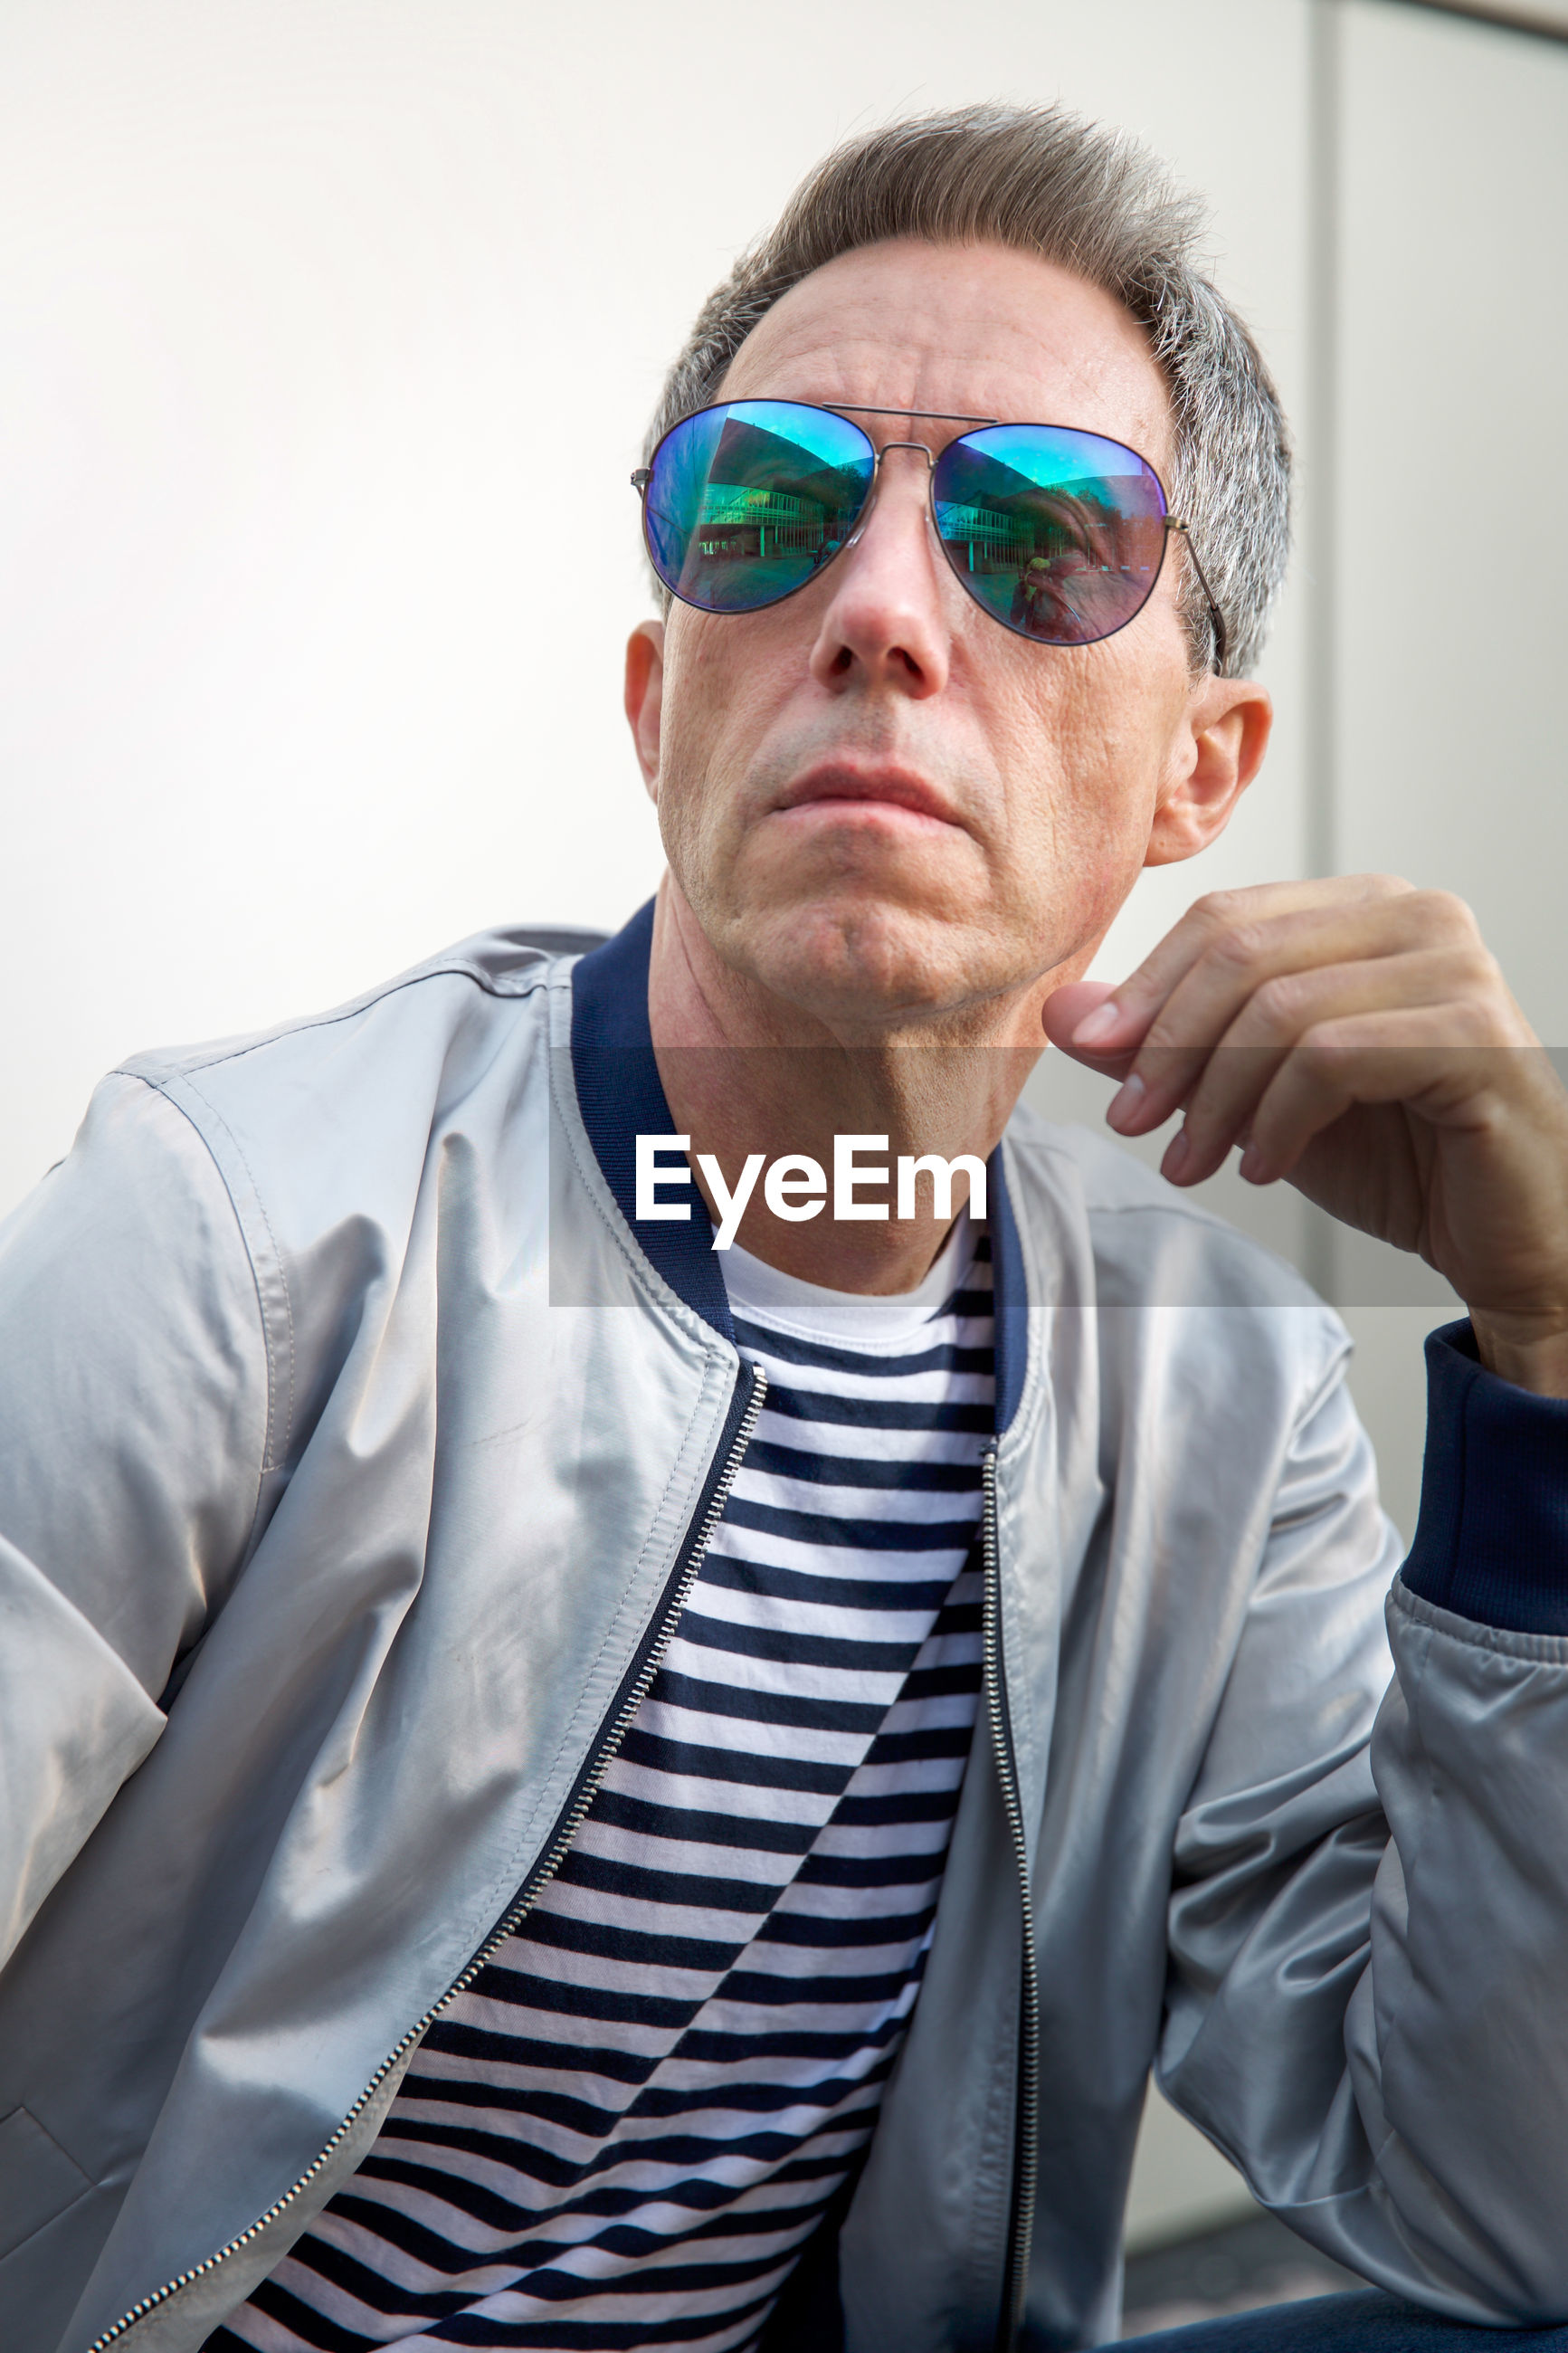 Man wearing sunglasses sitting against wall